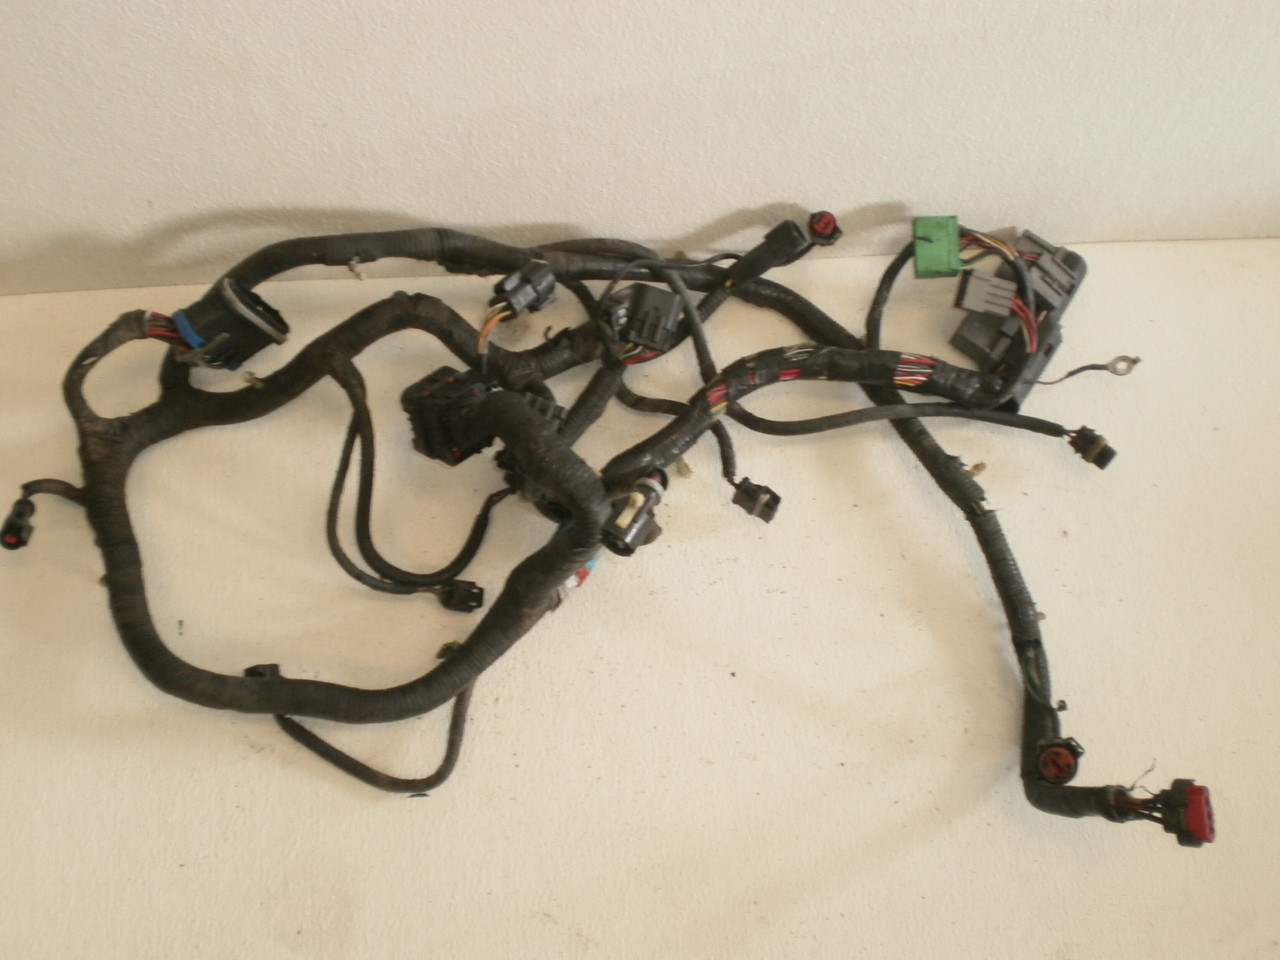 hight resolution of 2001 mustang alternator wiring harness wiring diagram schematics 2001 mustang gt engine wiring harness 01 mustang